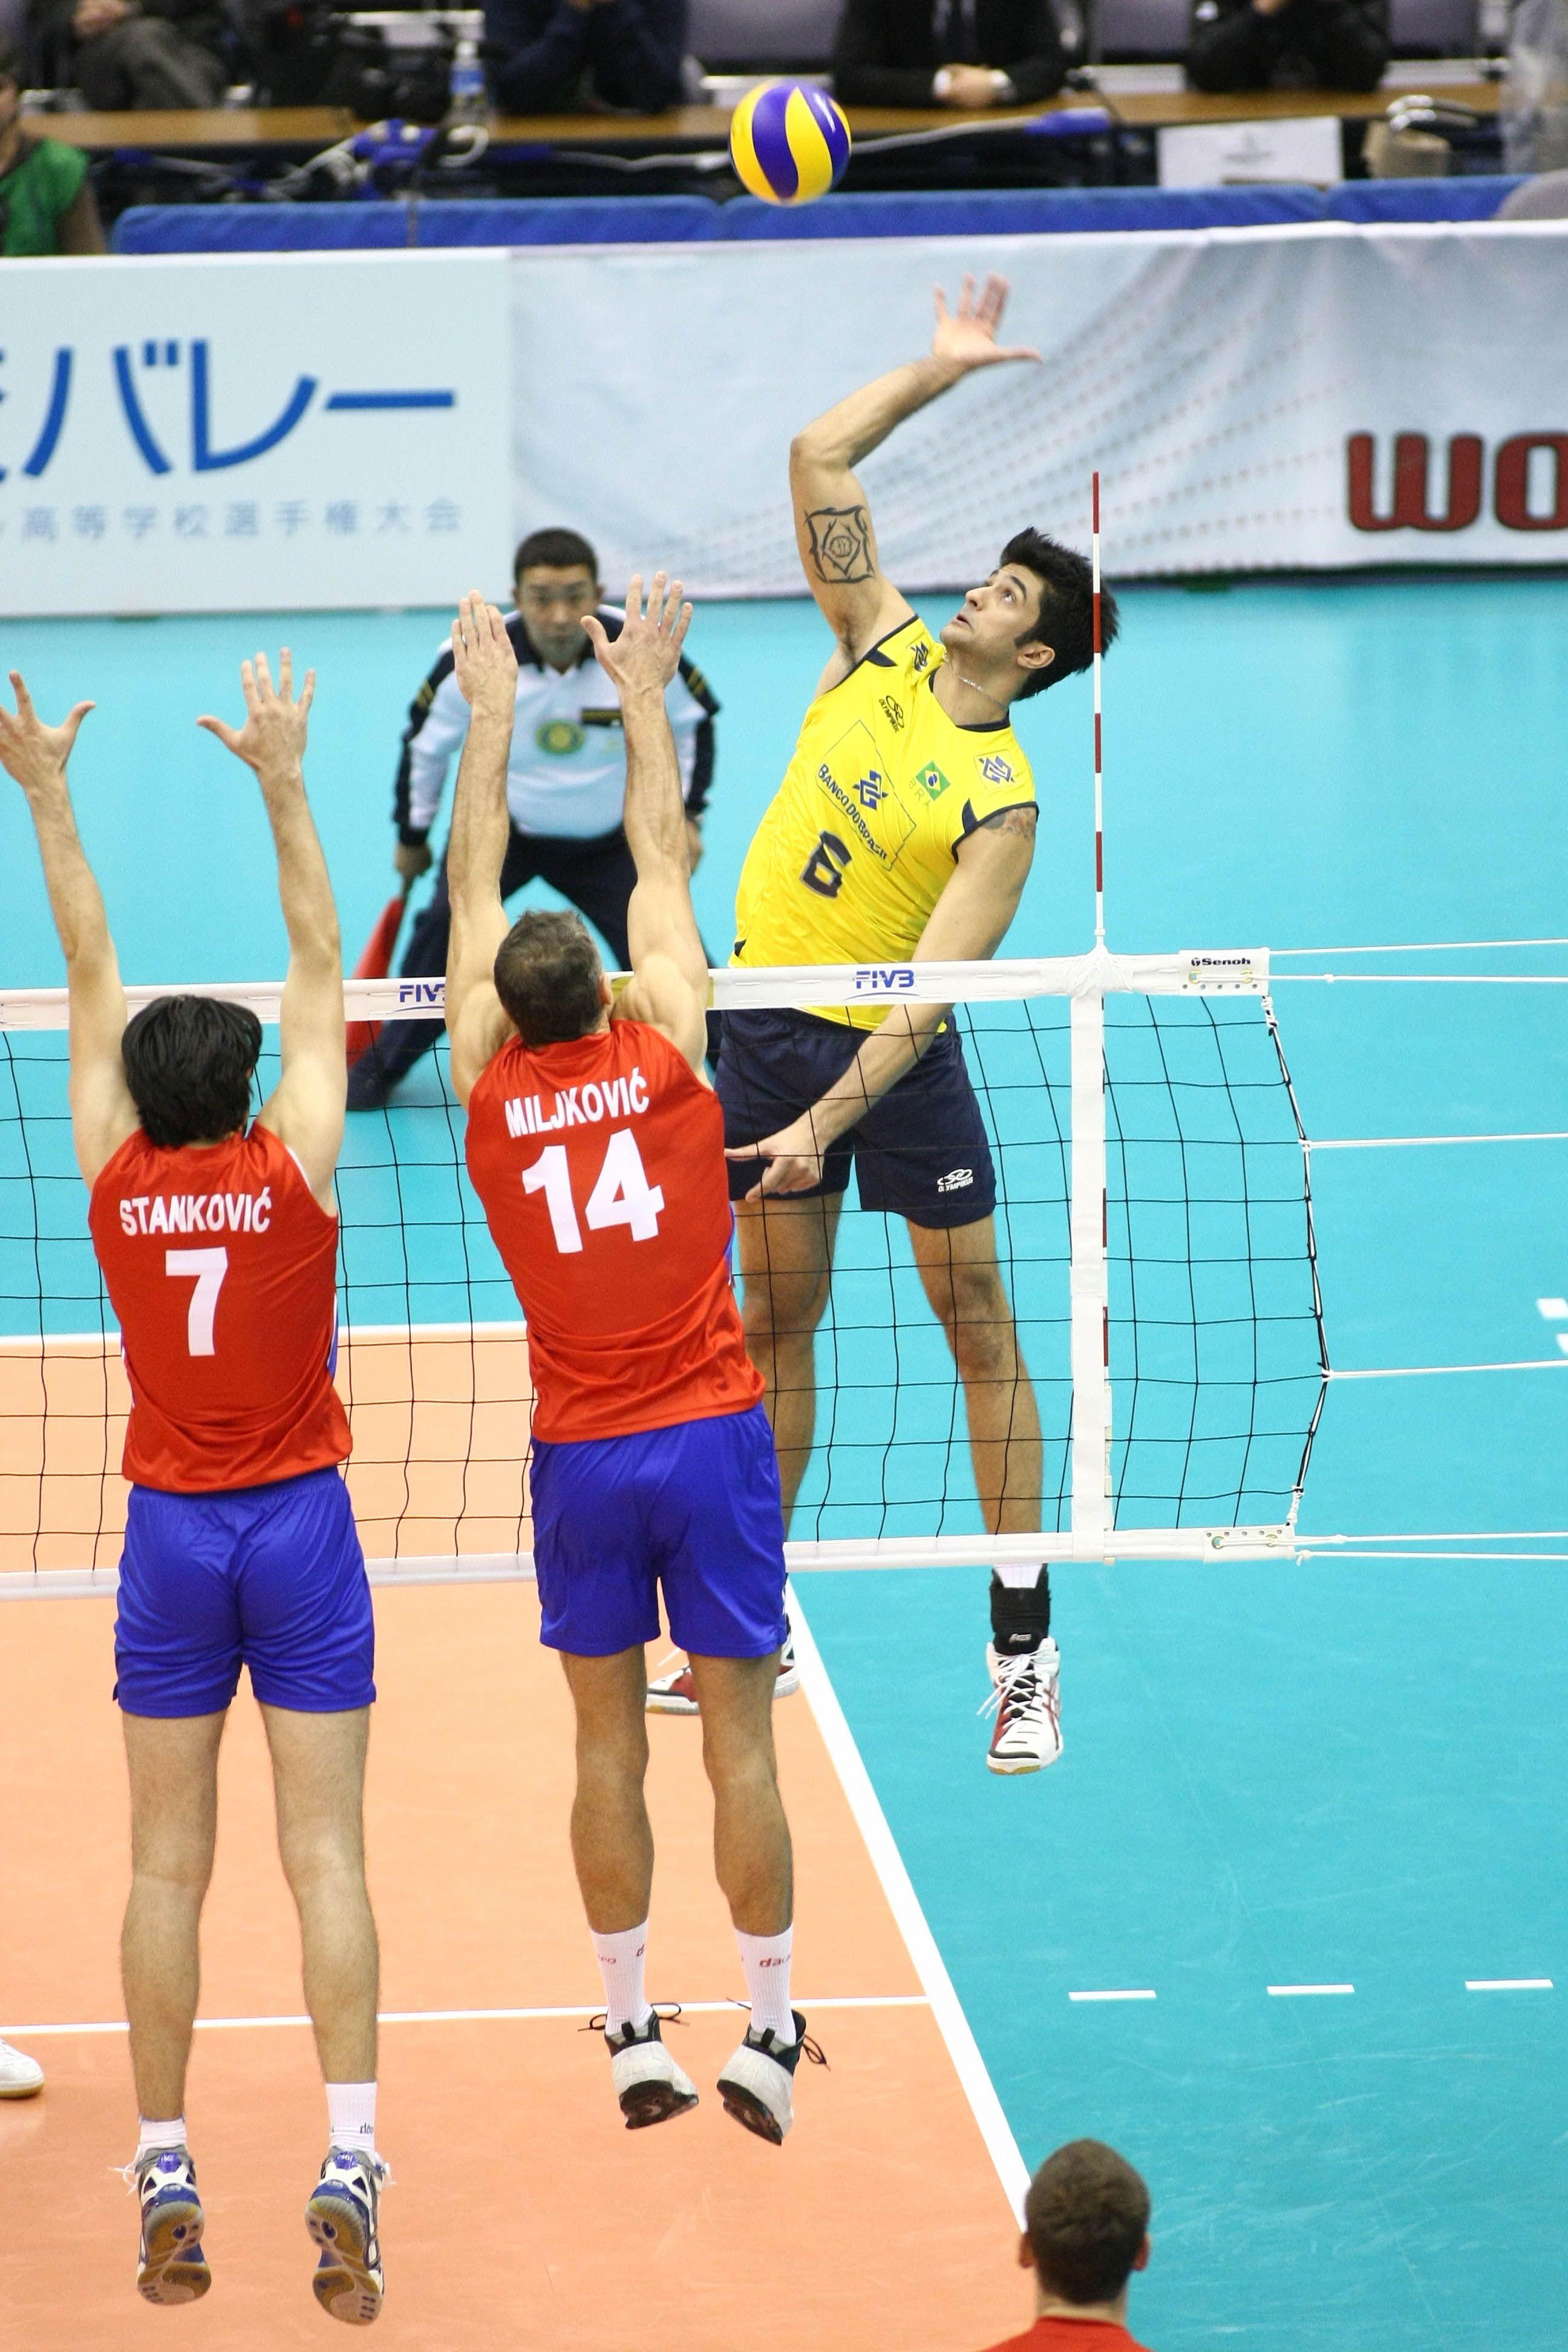 Leandro Vissotto Neves Bra Hits The Ball Against Blocks Volleyball Bra Ball